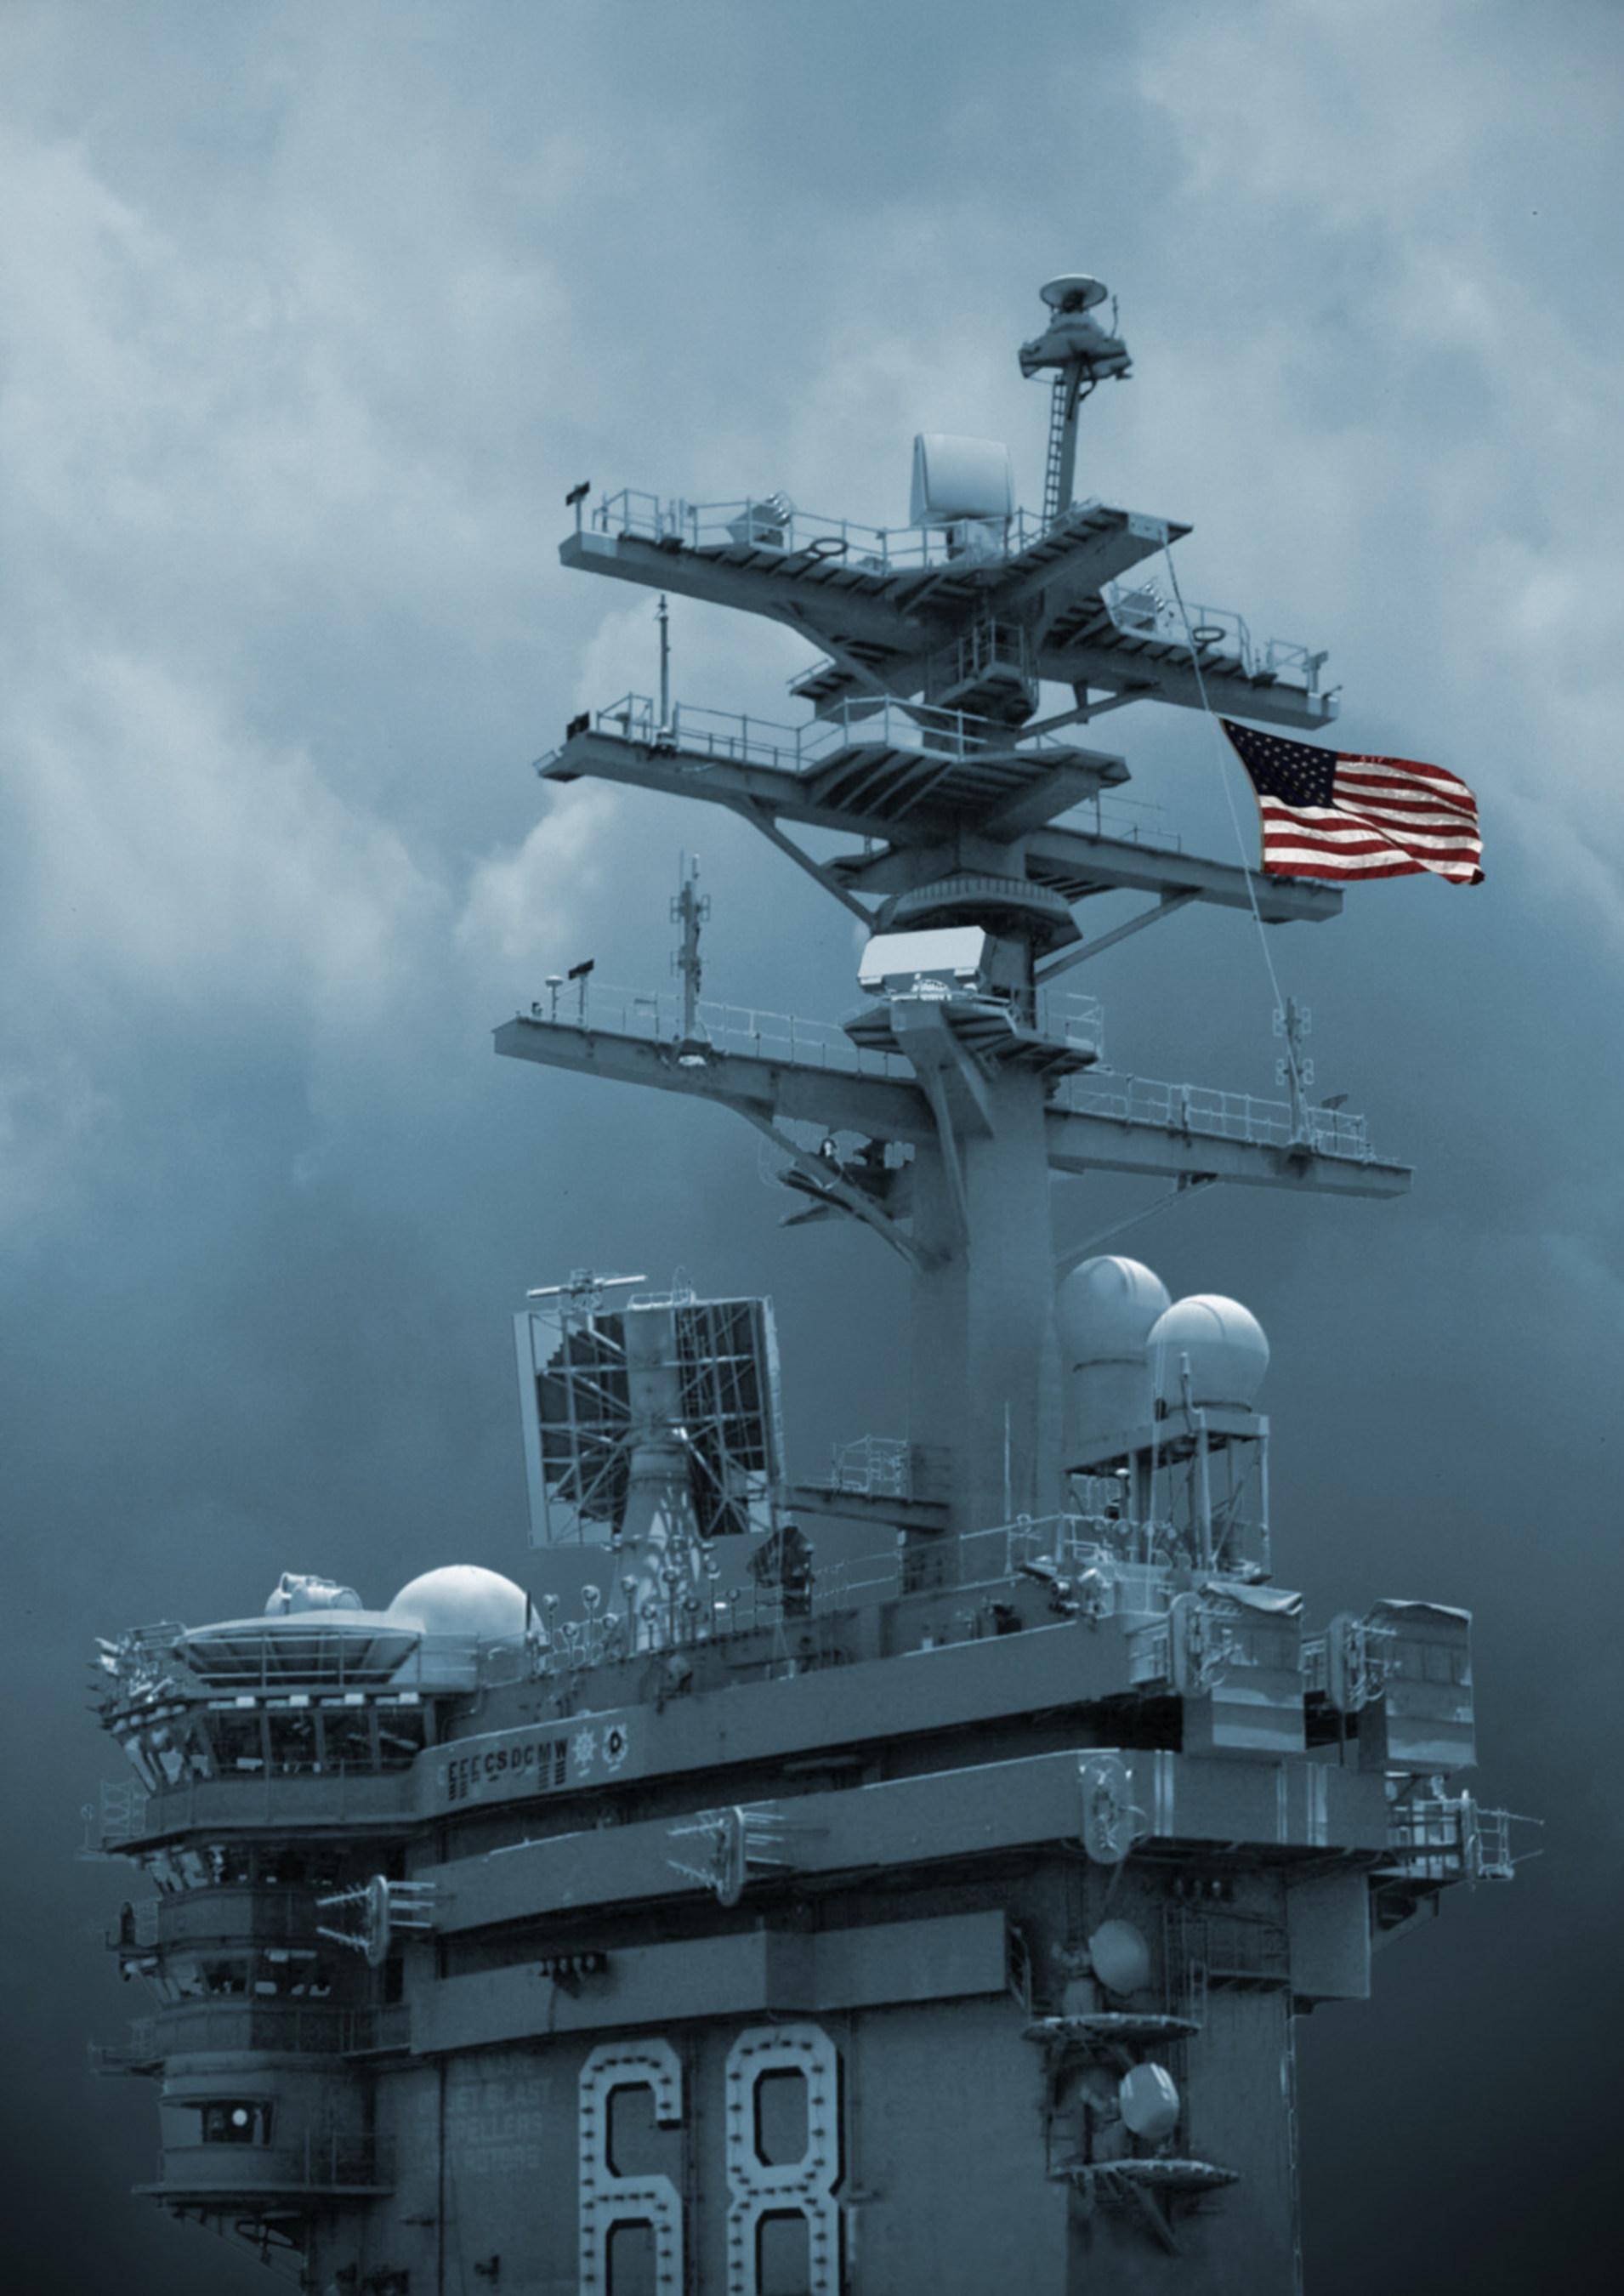 Saab to provide shipboard air traffic radar systems for U.S. Navy